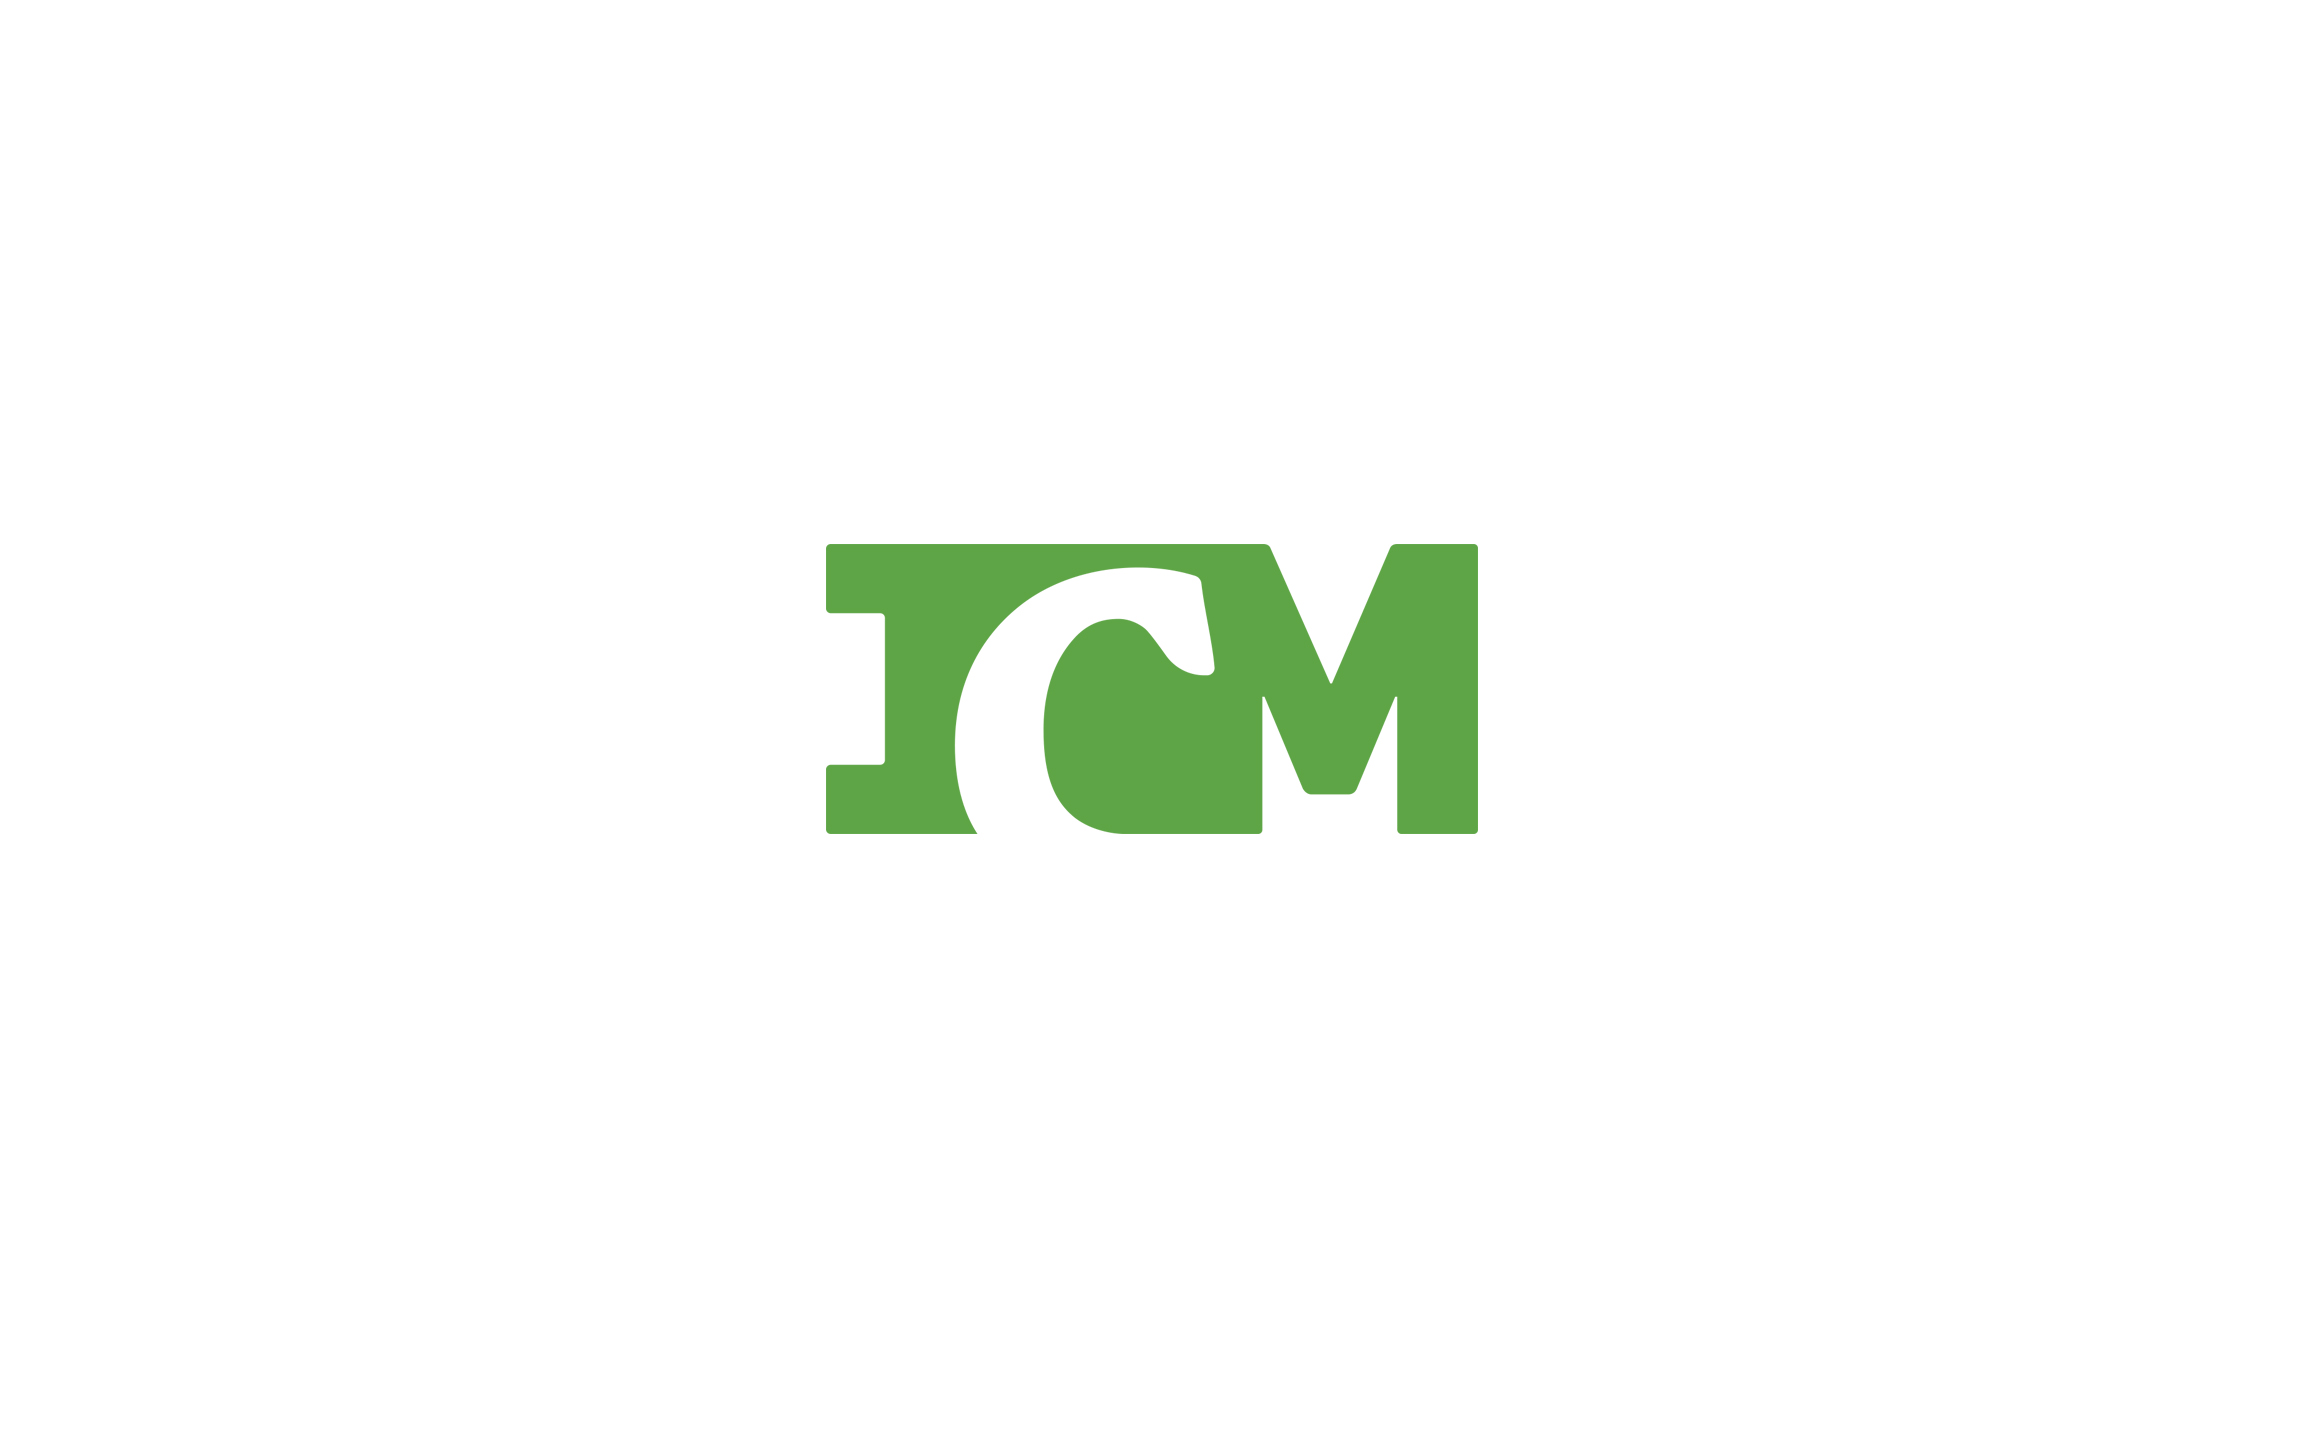 ICM_logo.jpg